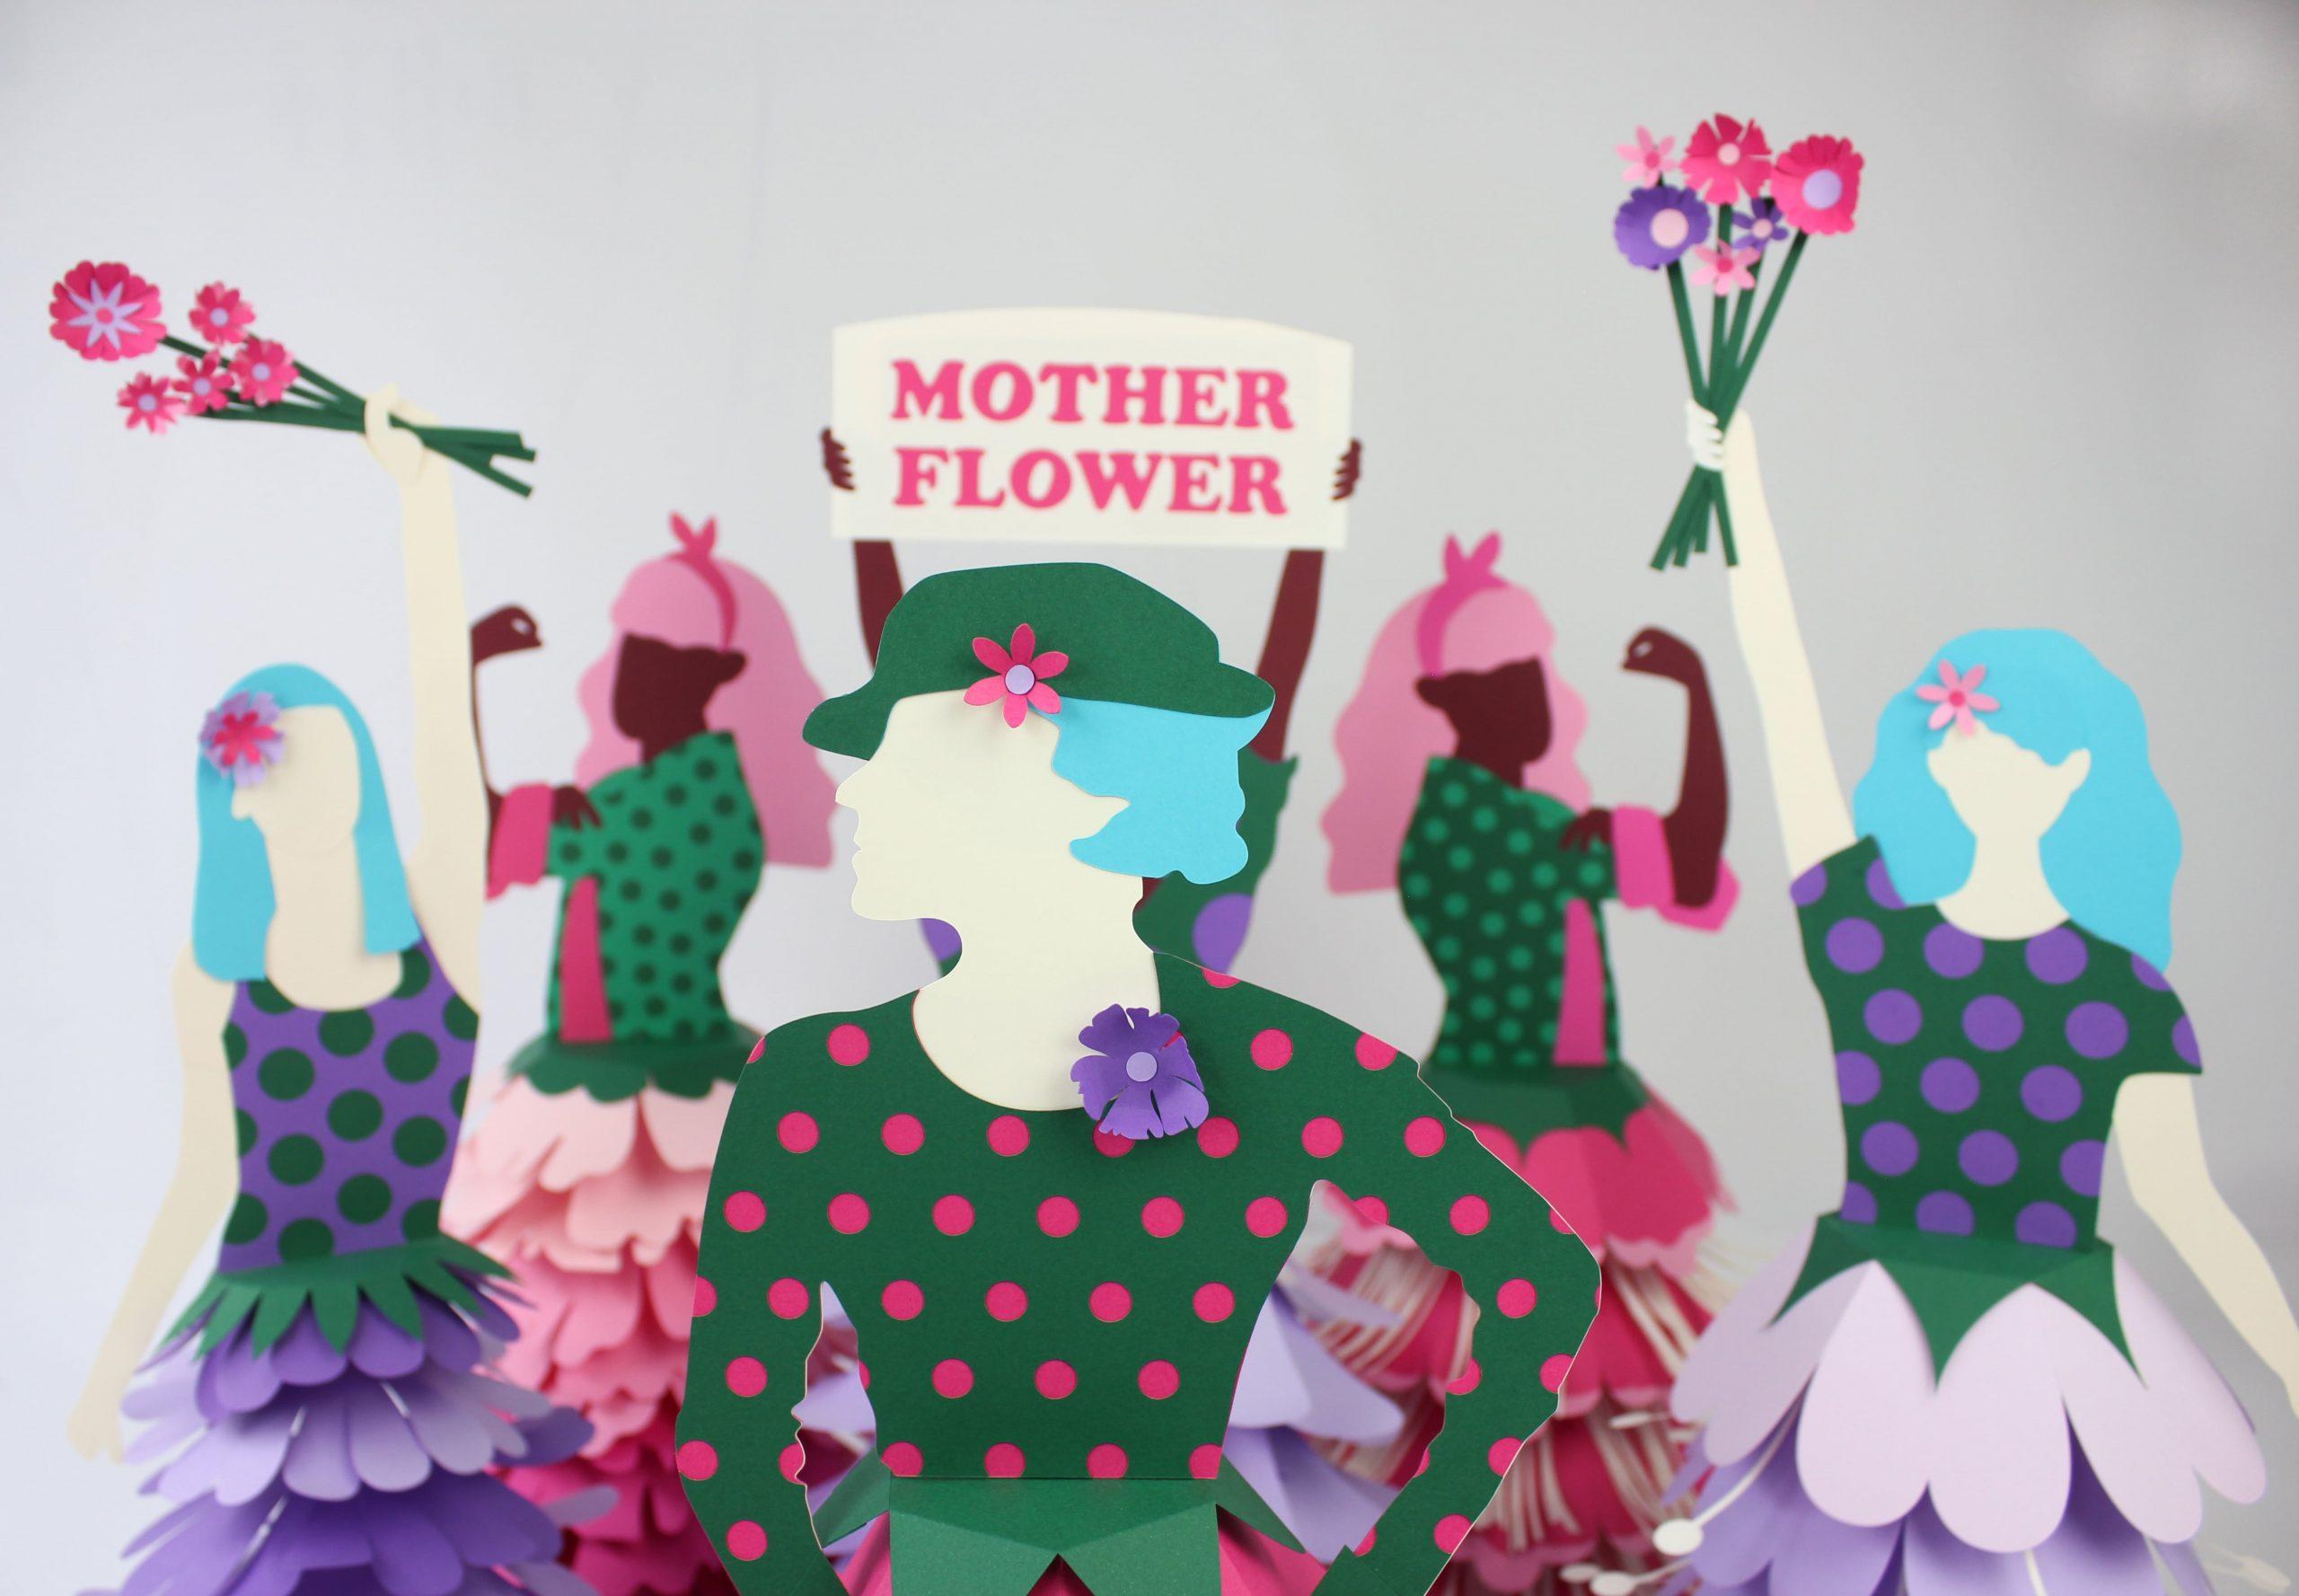 vitrine fête des mères illustration paper art barreau